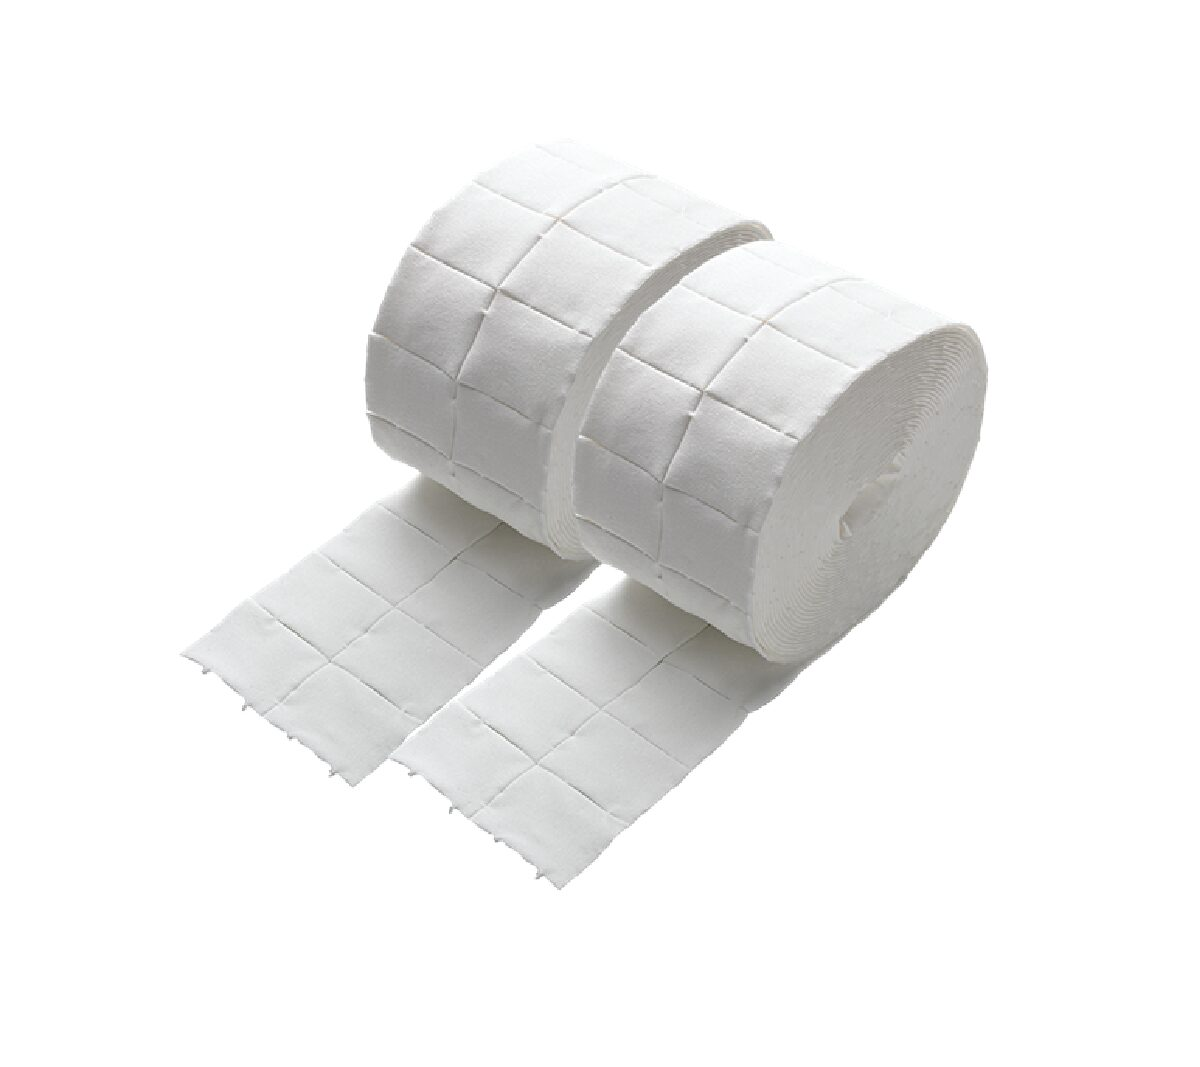 Cuadritos de Celulosa 4x5cm 2×500 unidades